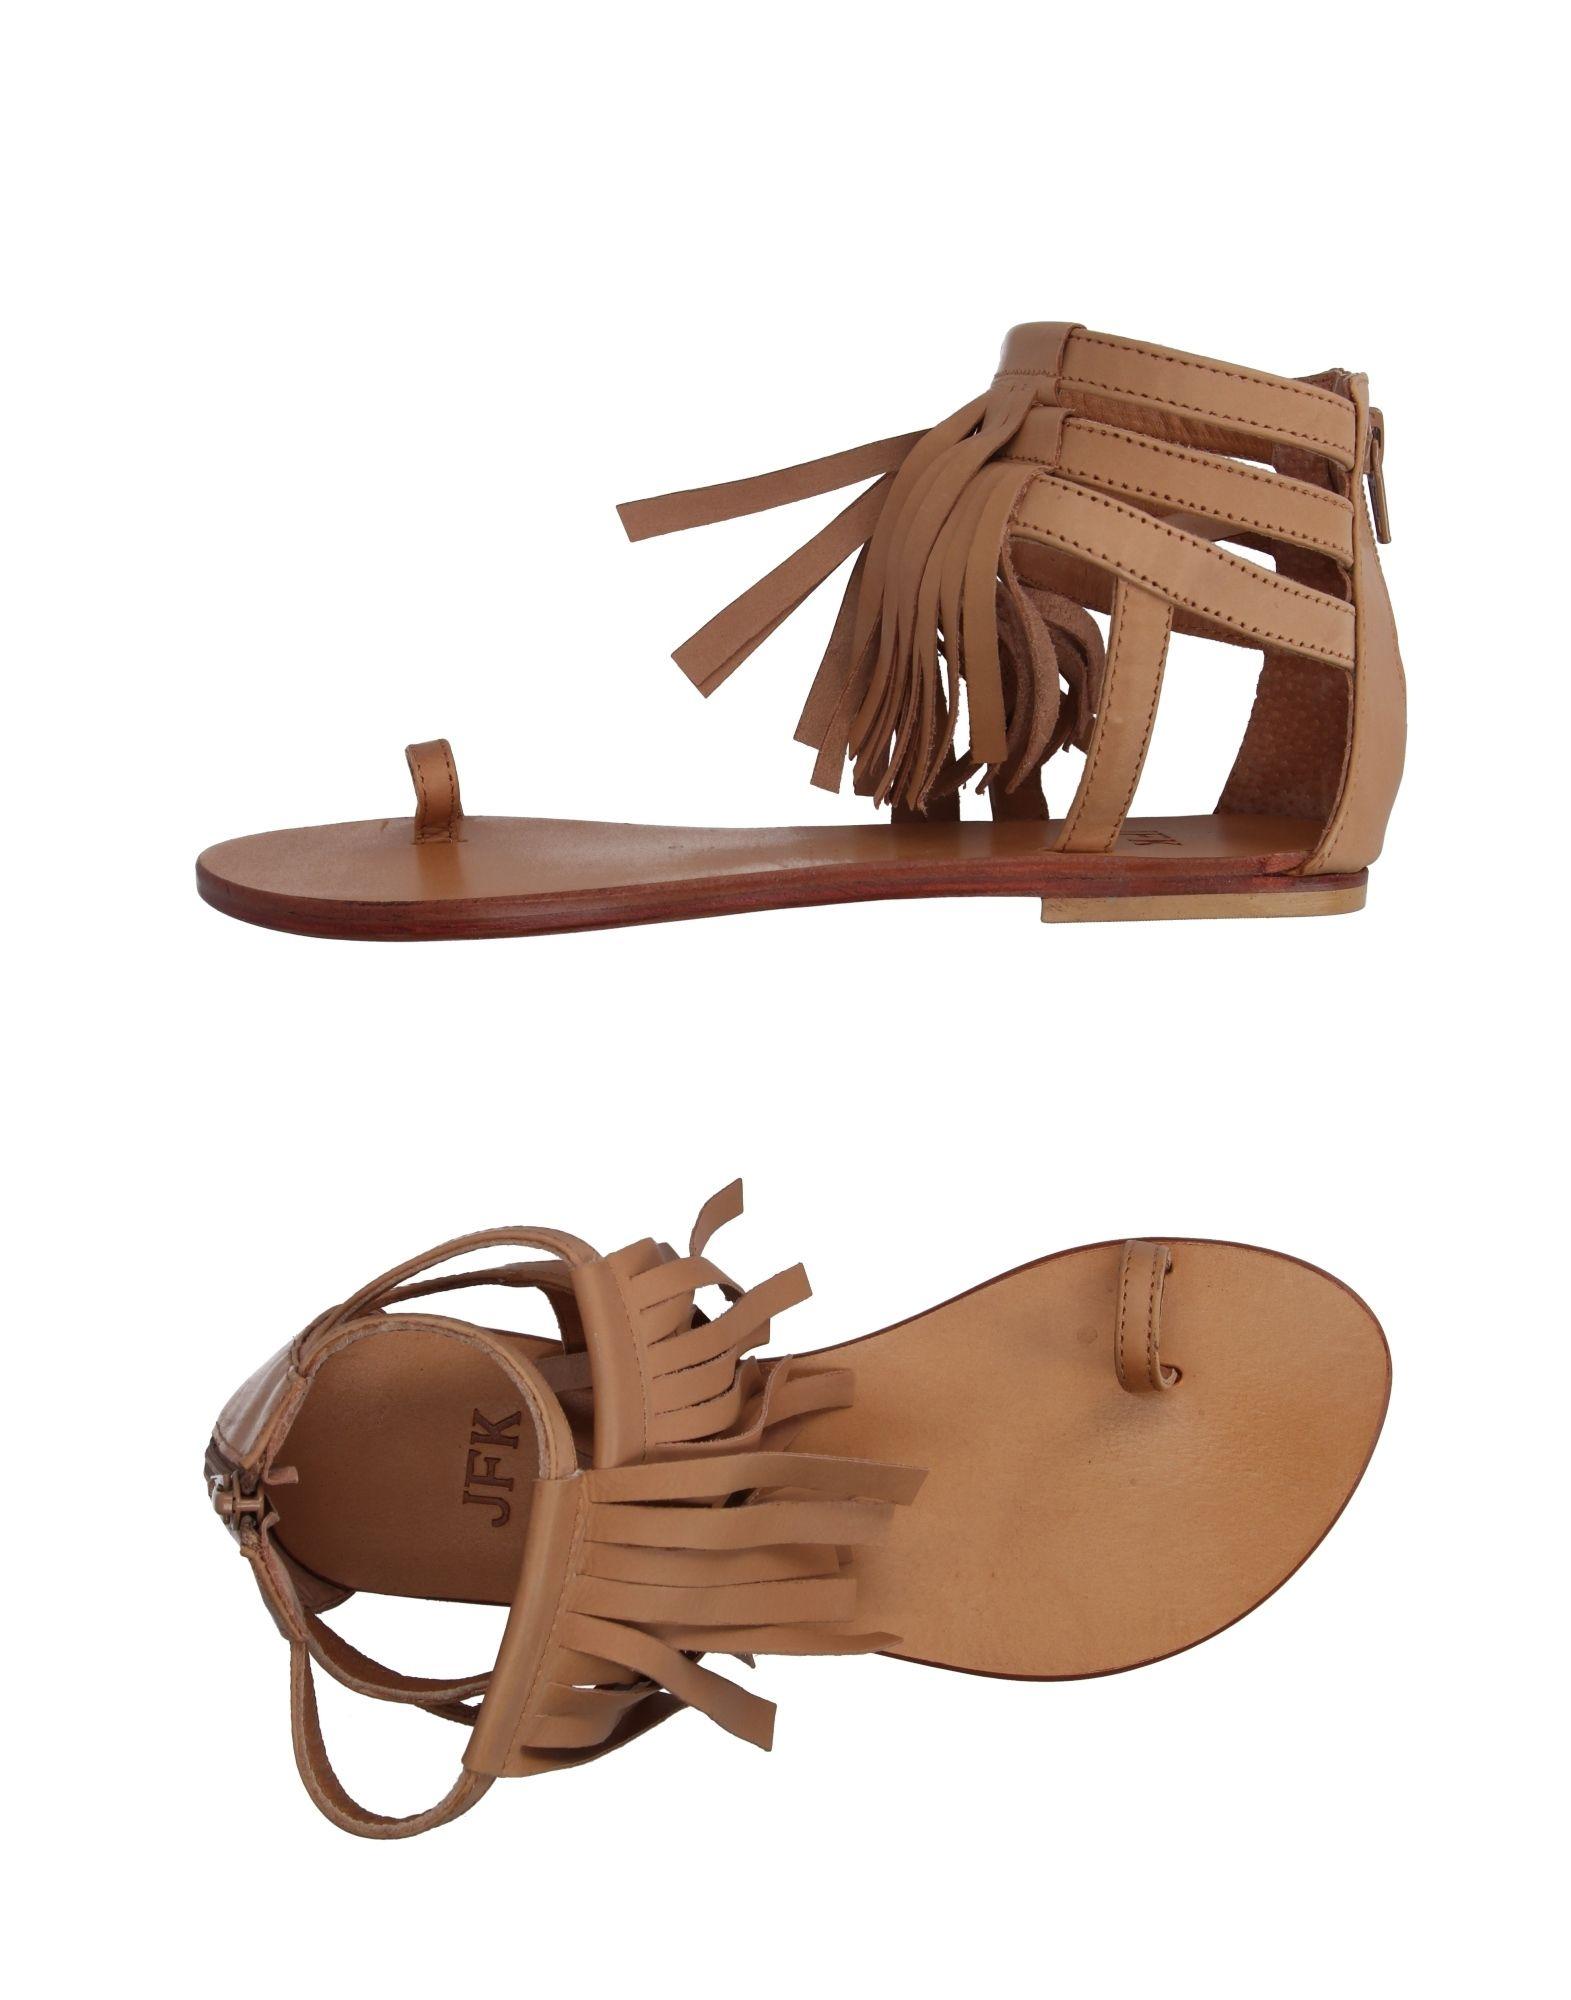 Jfk Dianetten Damen  11144134ST Gute Qualität beliebte Schuhe